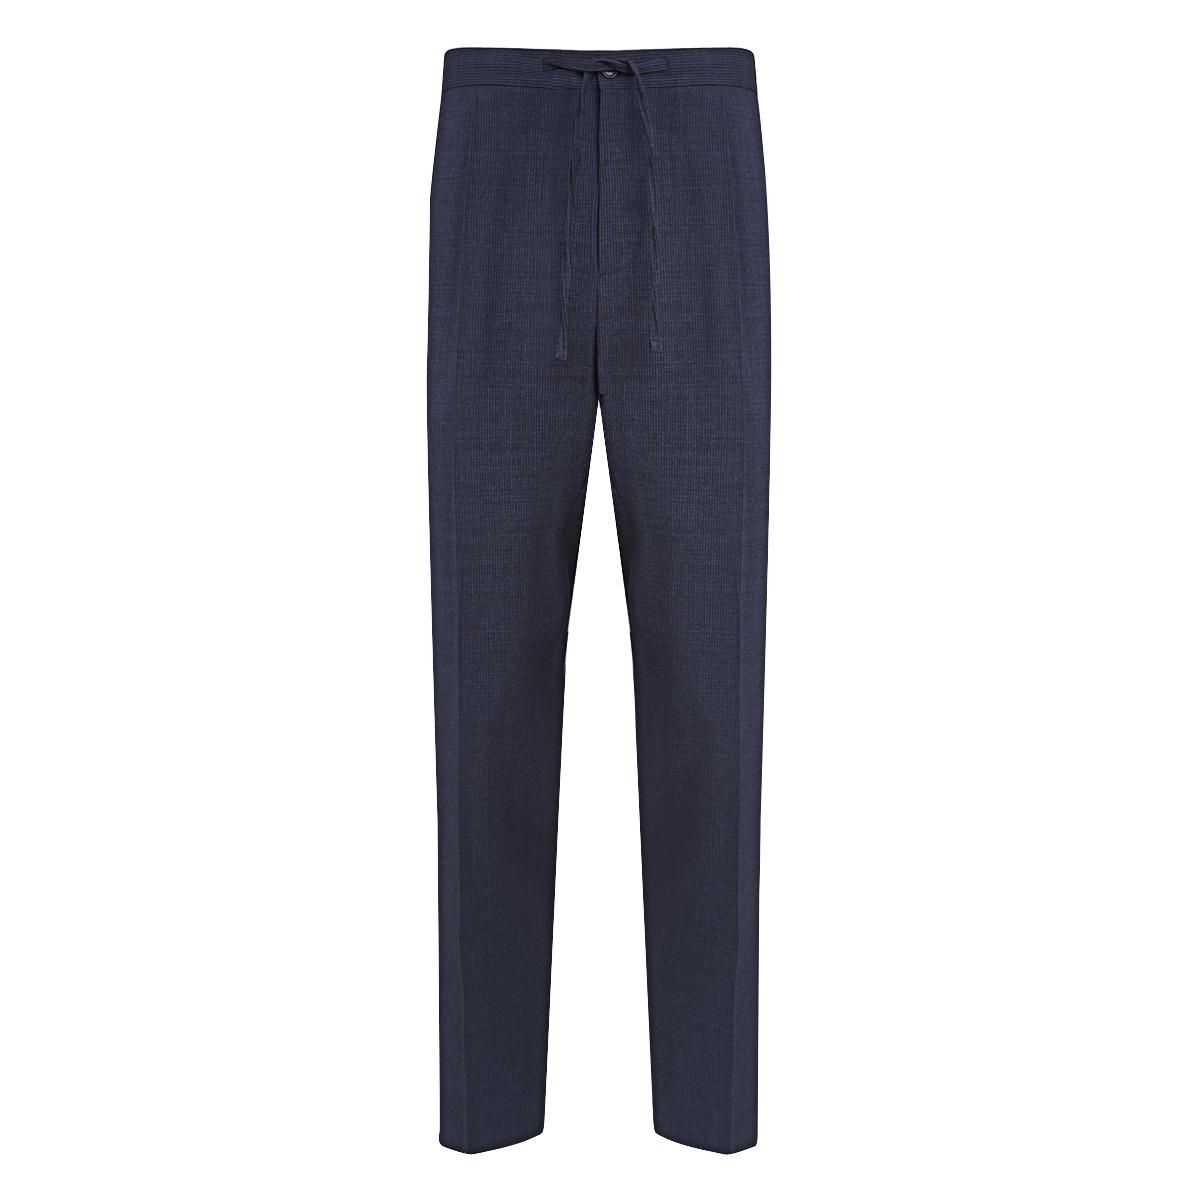 Blue Virgin Wool Blend Drawstring Trousers